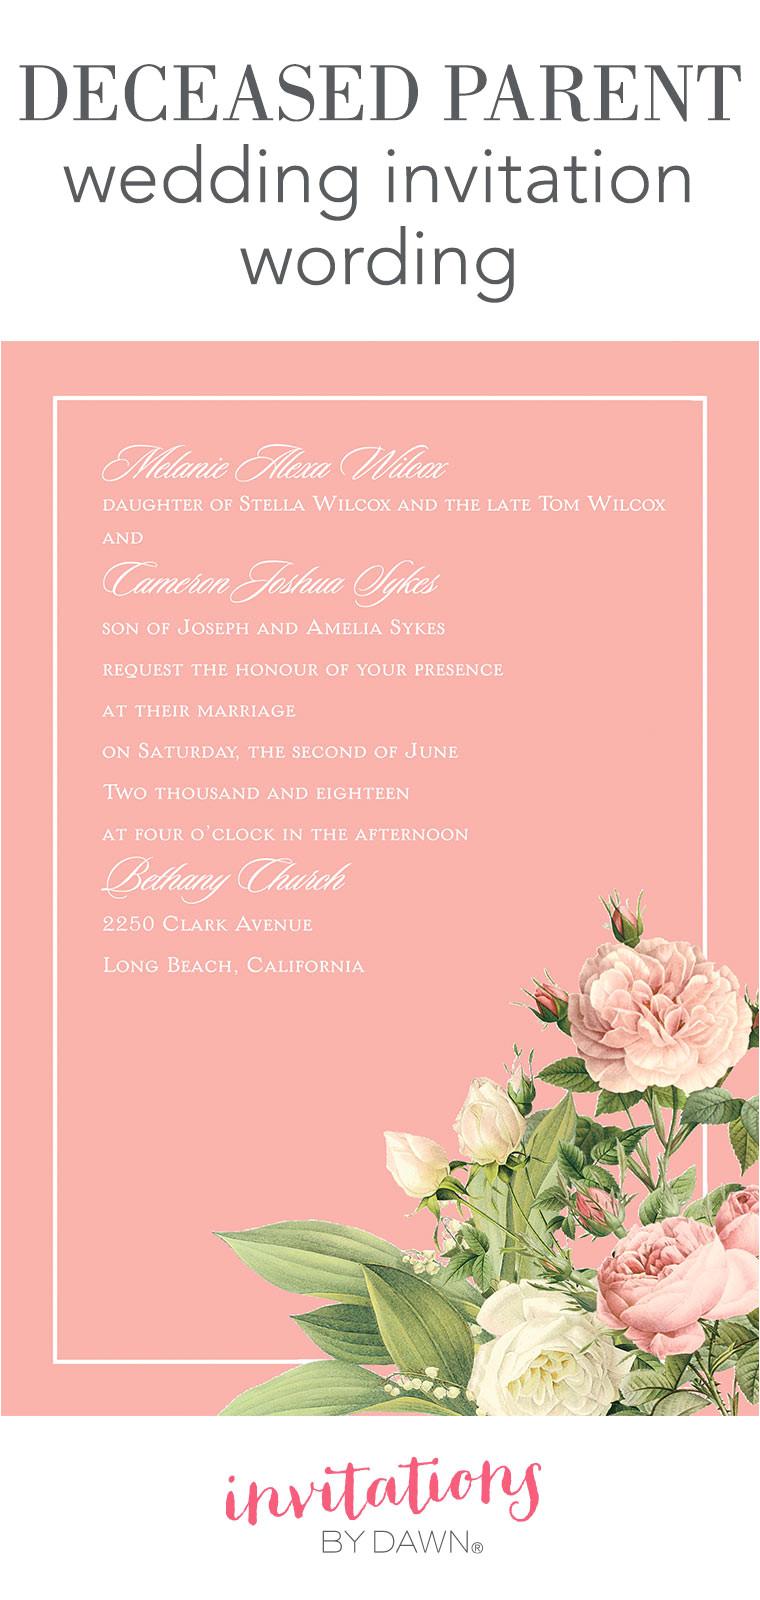 dawn a deceased parent wedding invitation wording main 042216 jpg